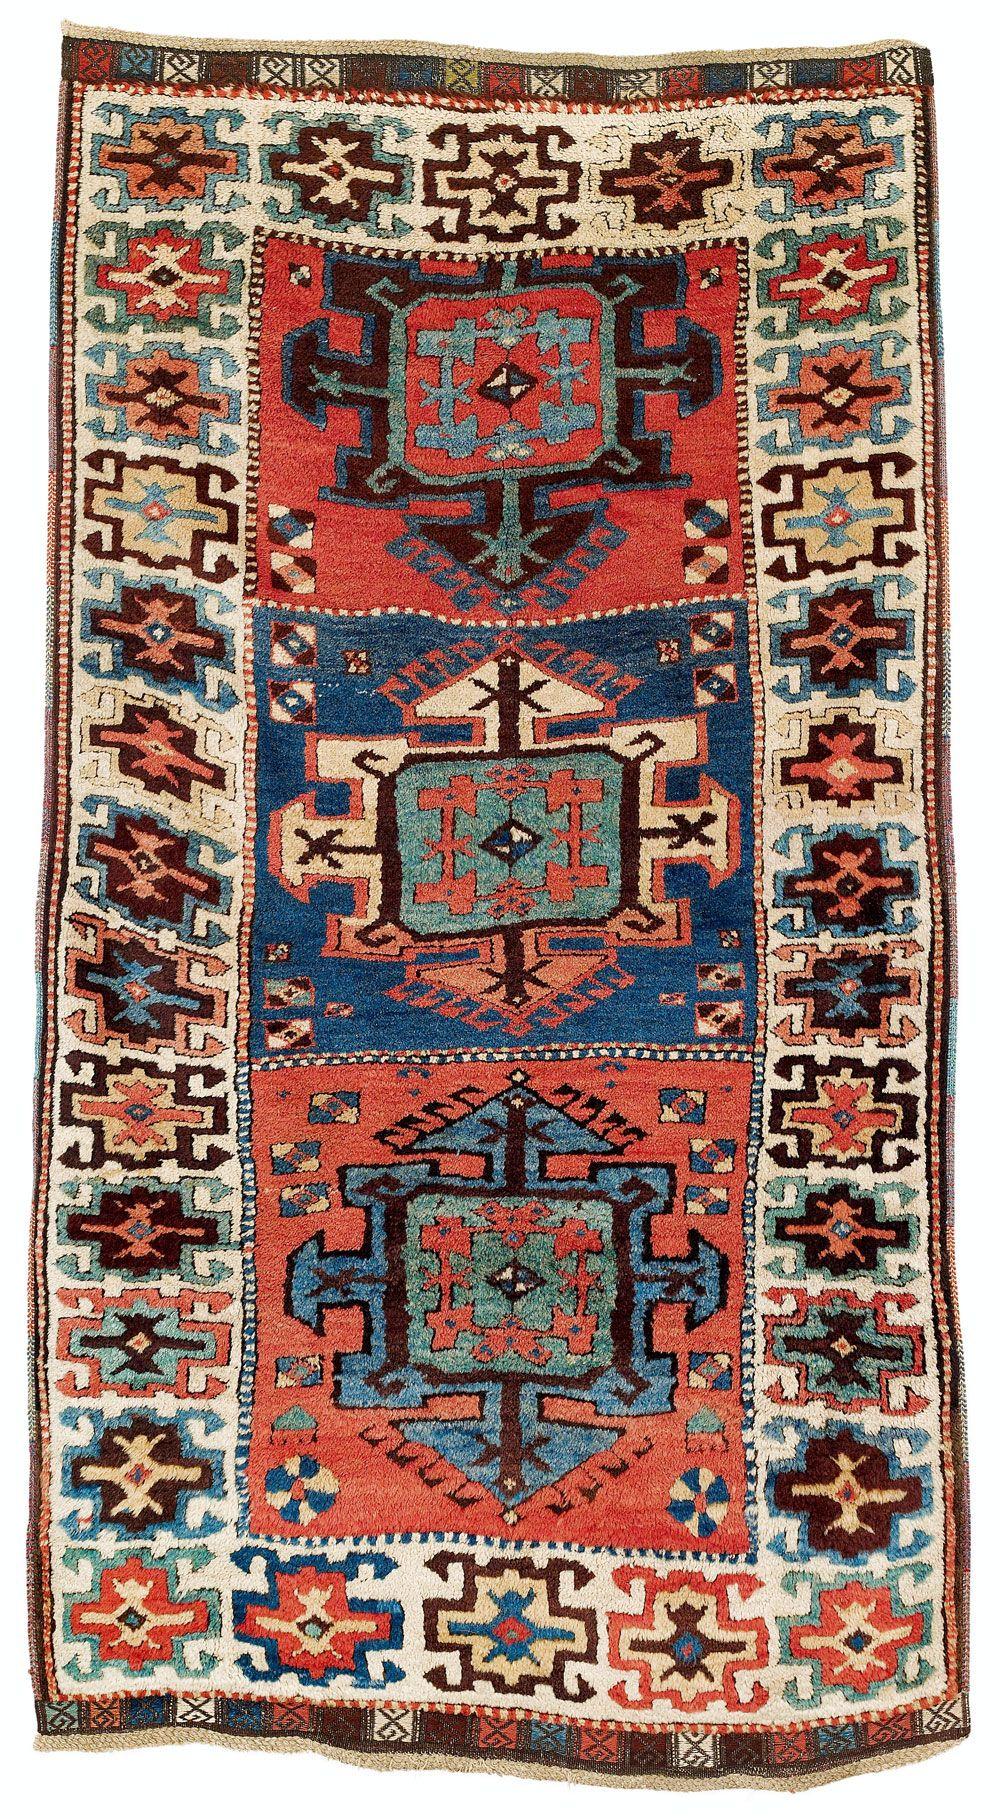 Kurdish Rug East Anatolia First Half 19th Century Rugs And